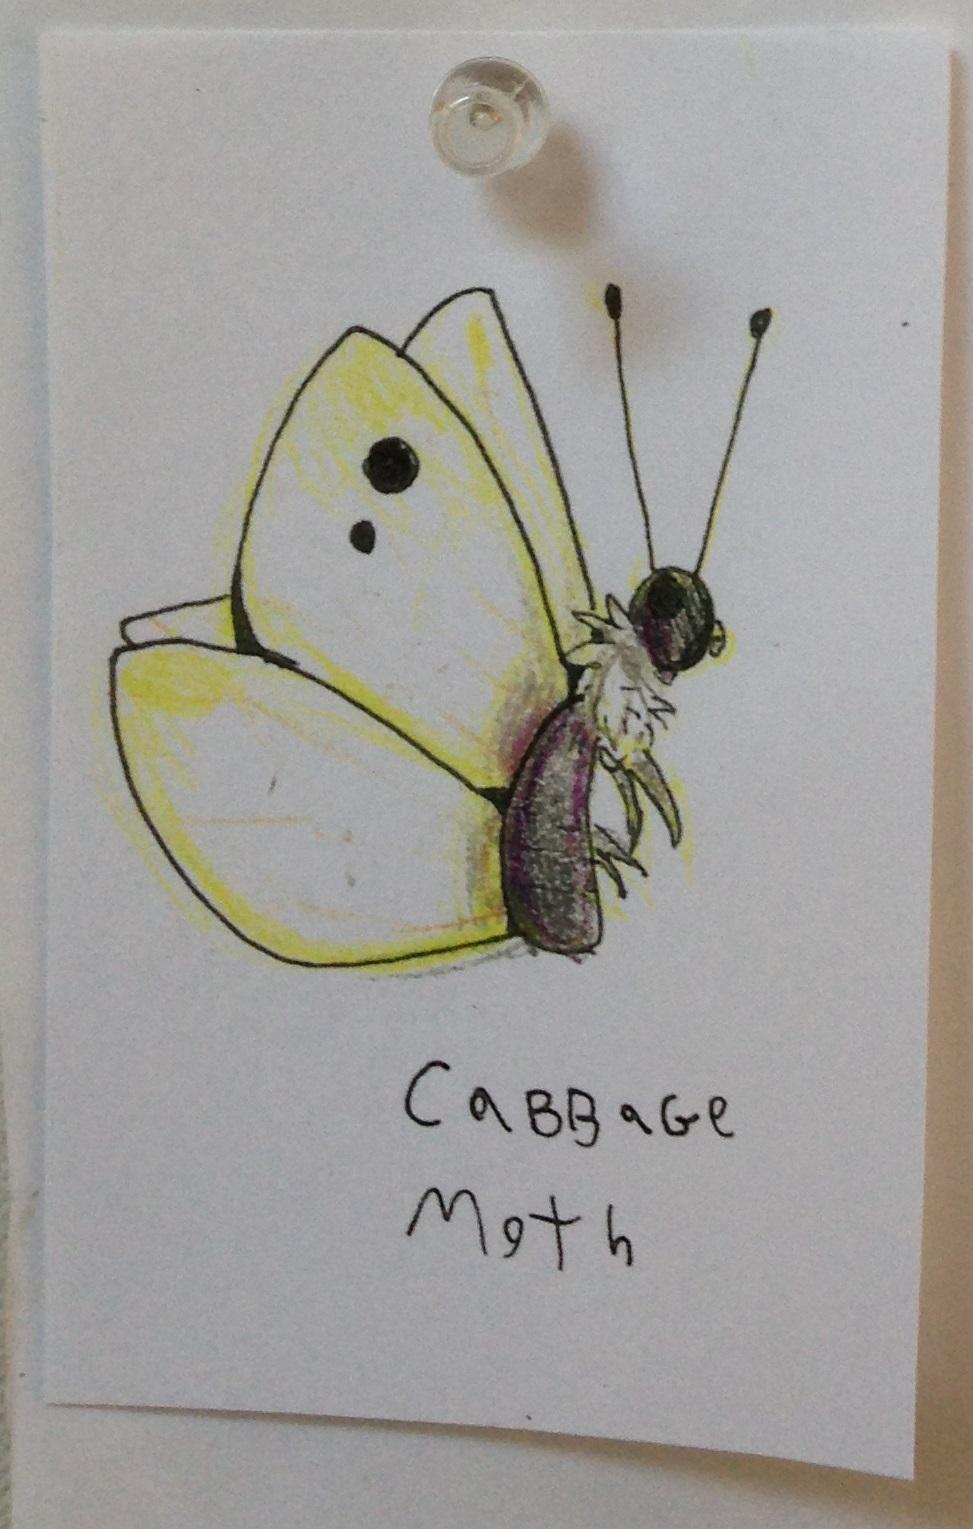 Cabbage Moth mk.jpg